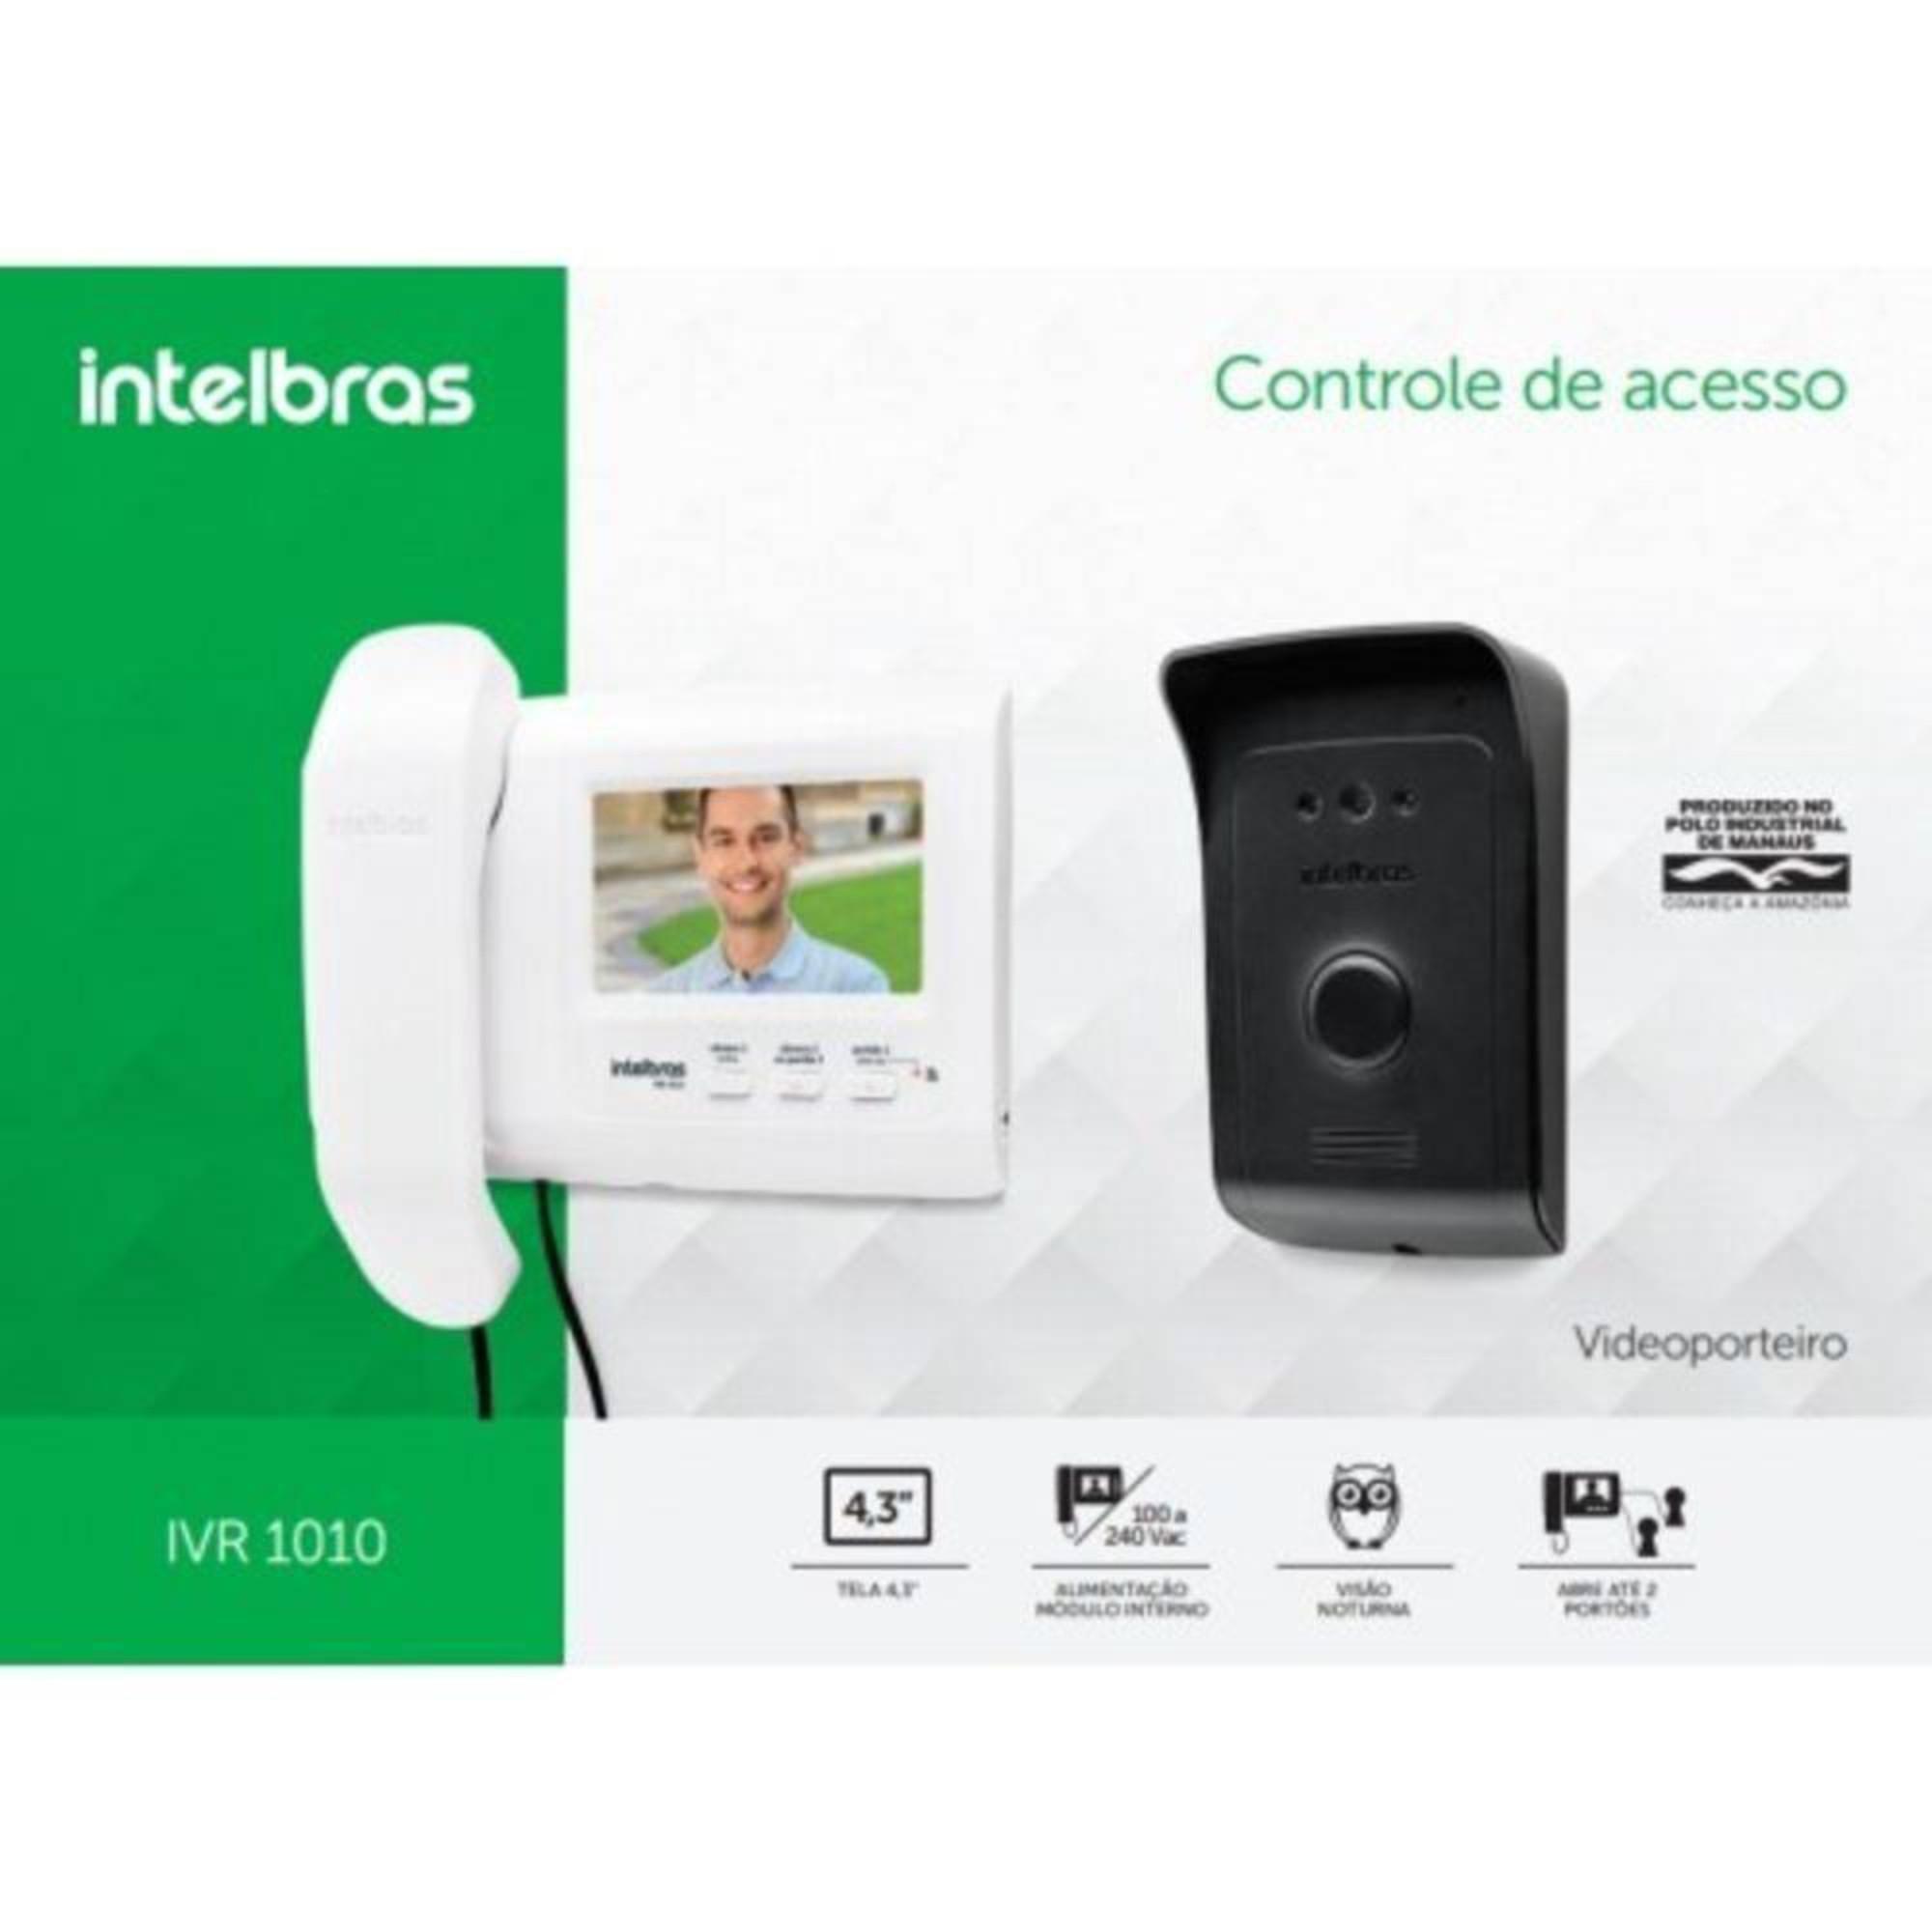 Vídeo Porteiro Intelbras IVR 1010 C/ LCD 4,3 Polegadas